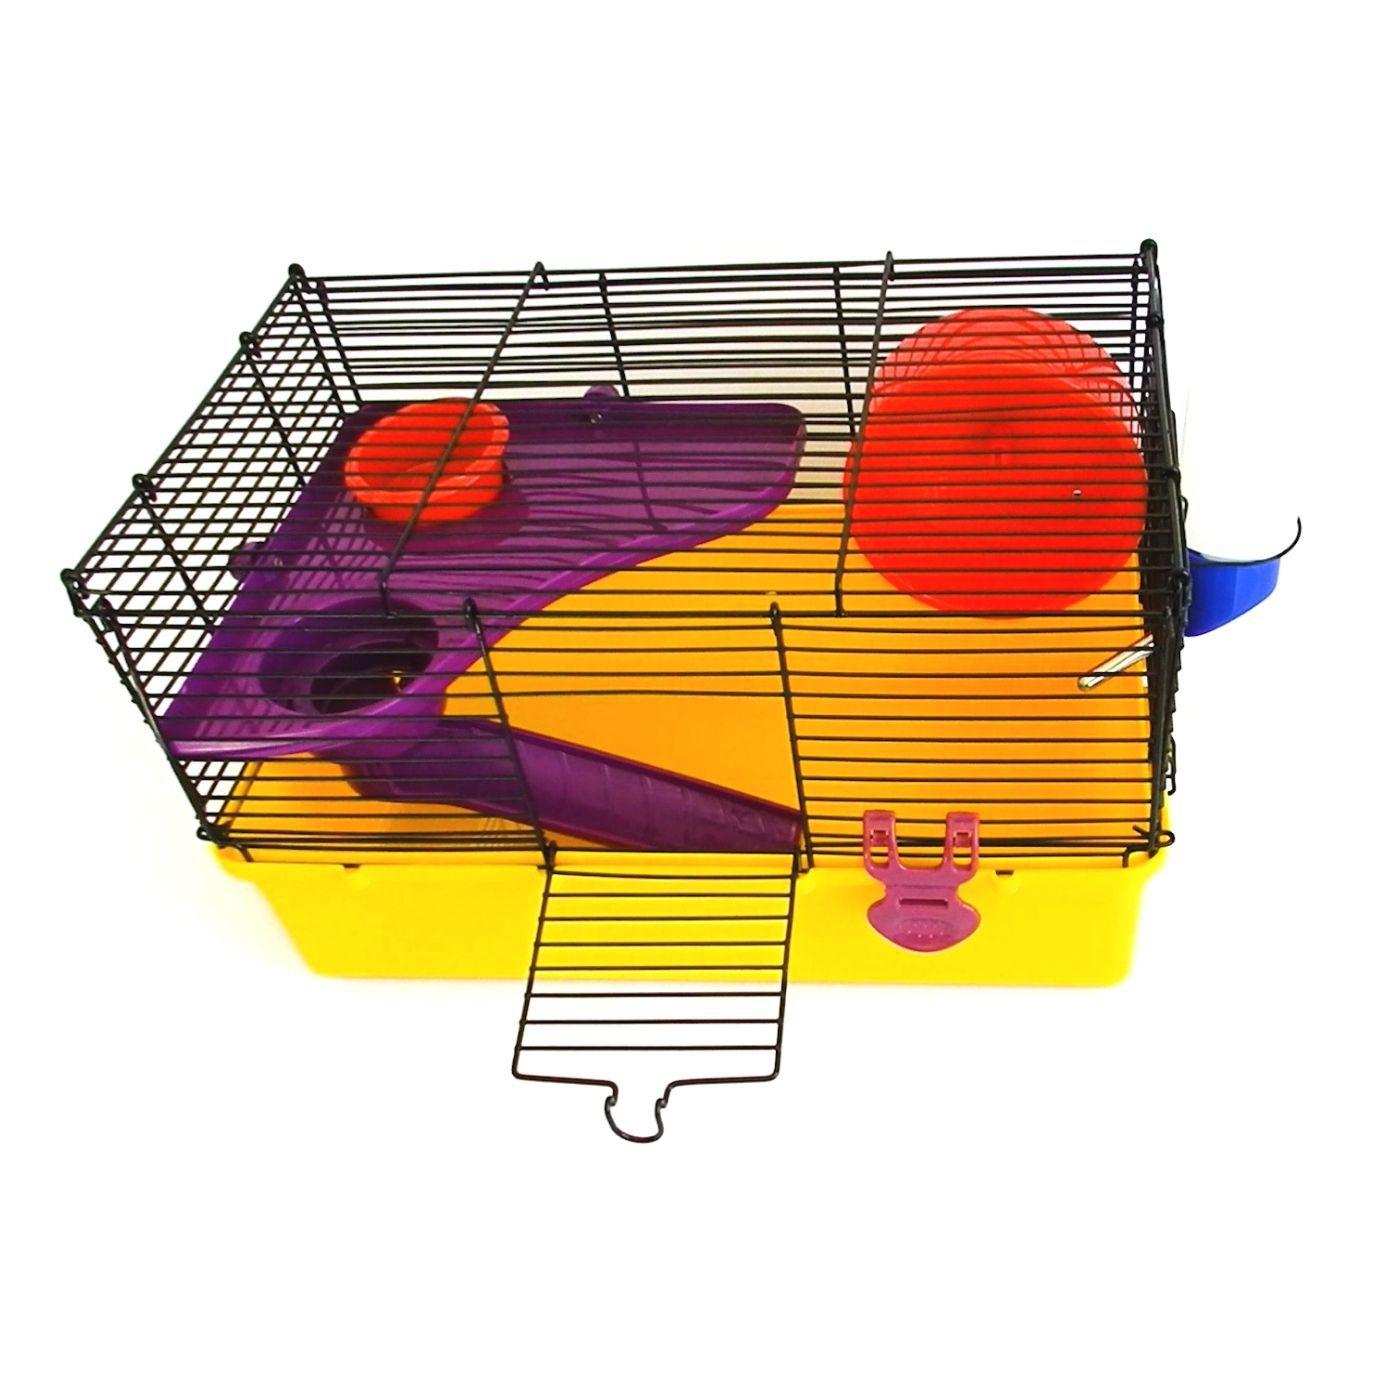 Gaiola Completa para Hamster com Mezanino Pawise